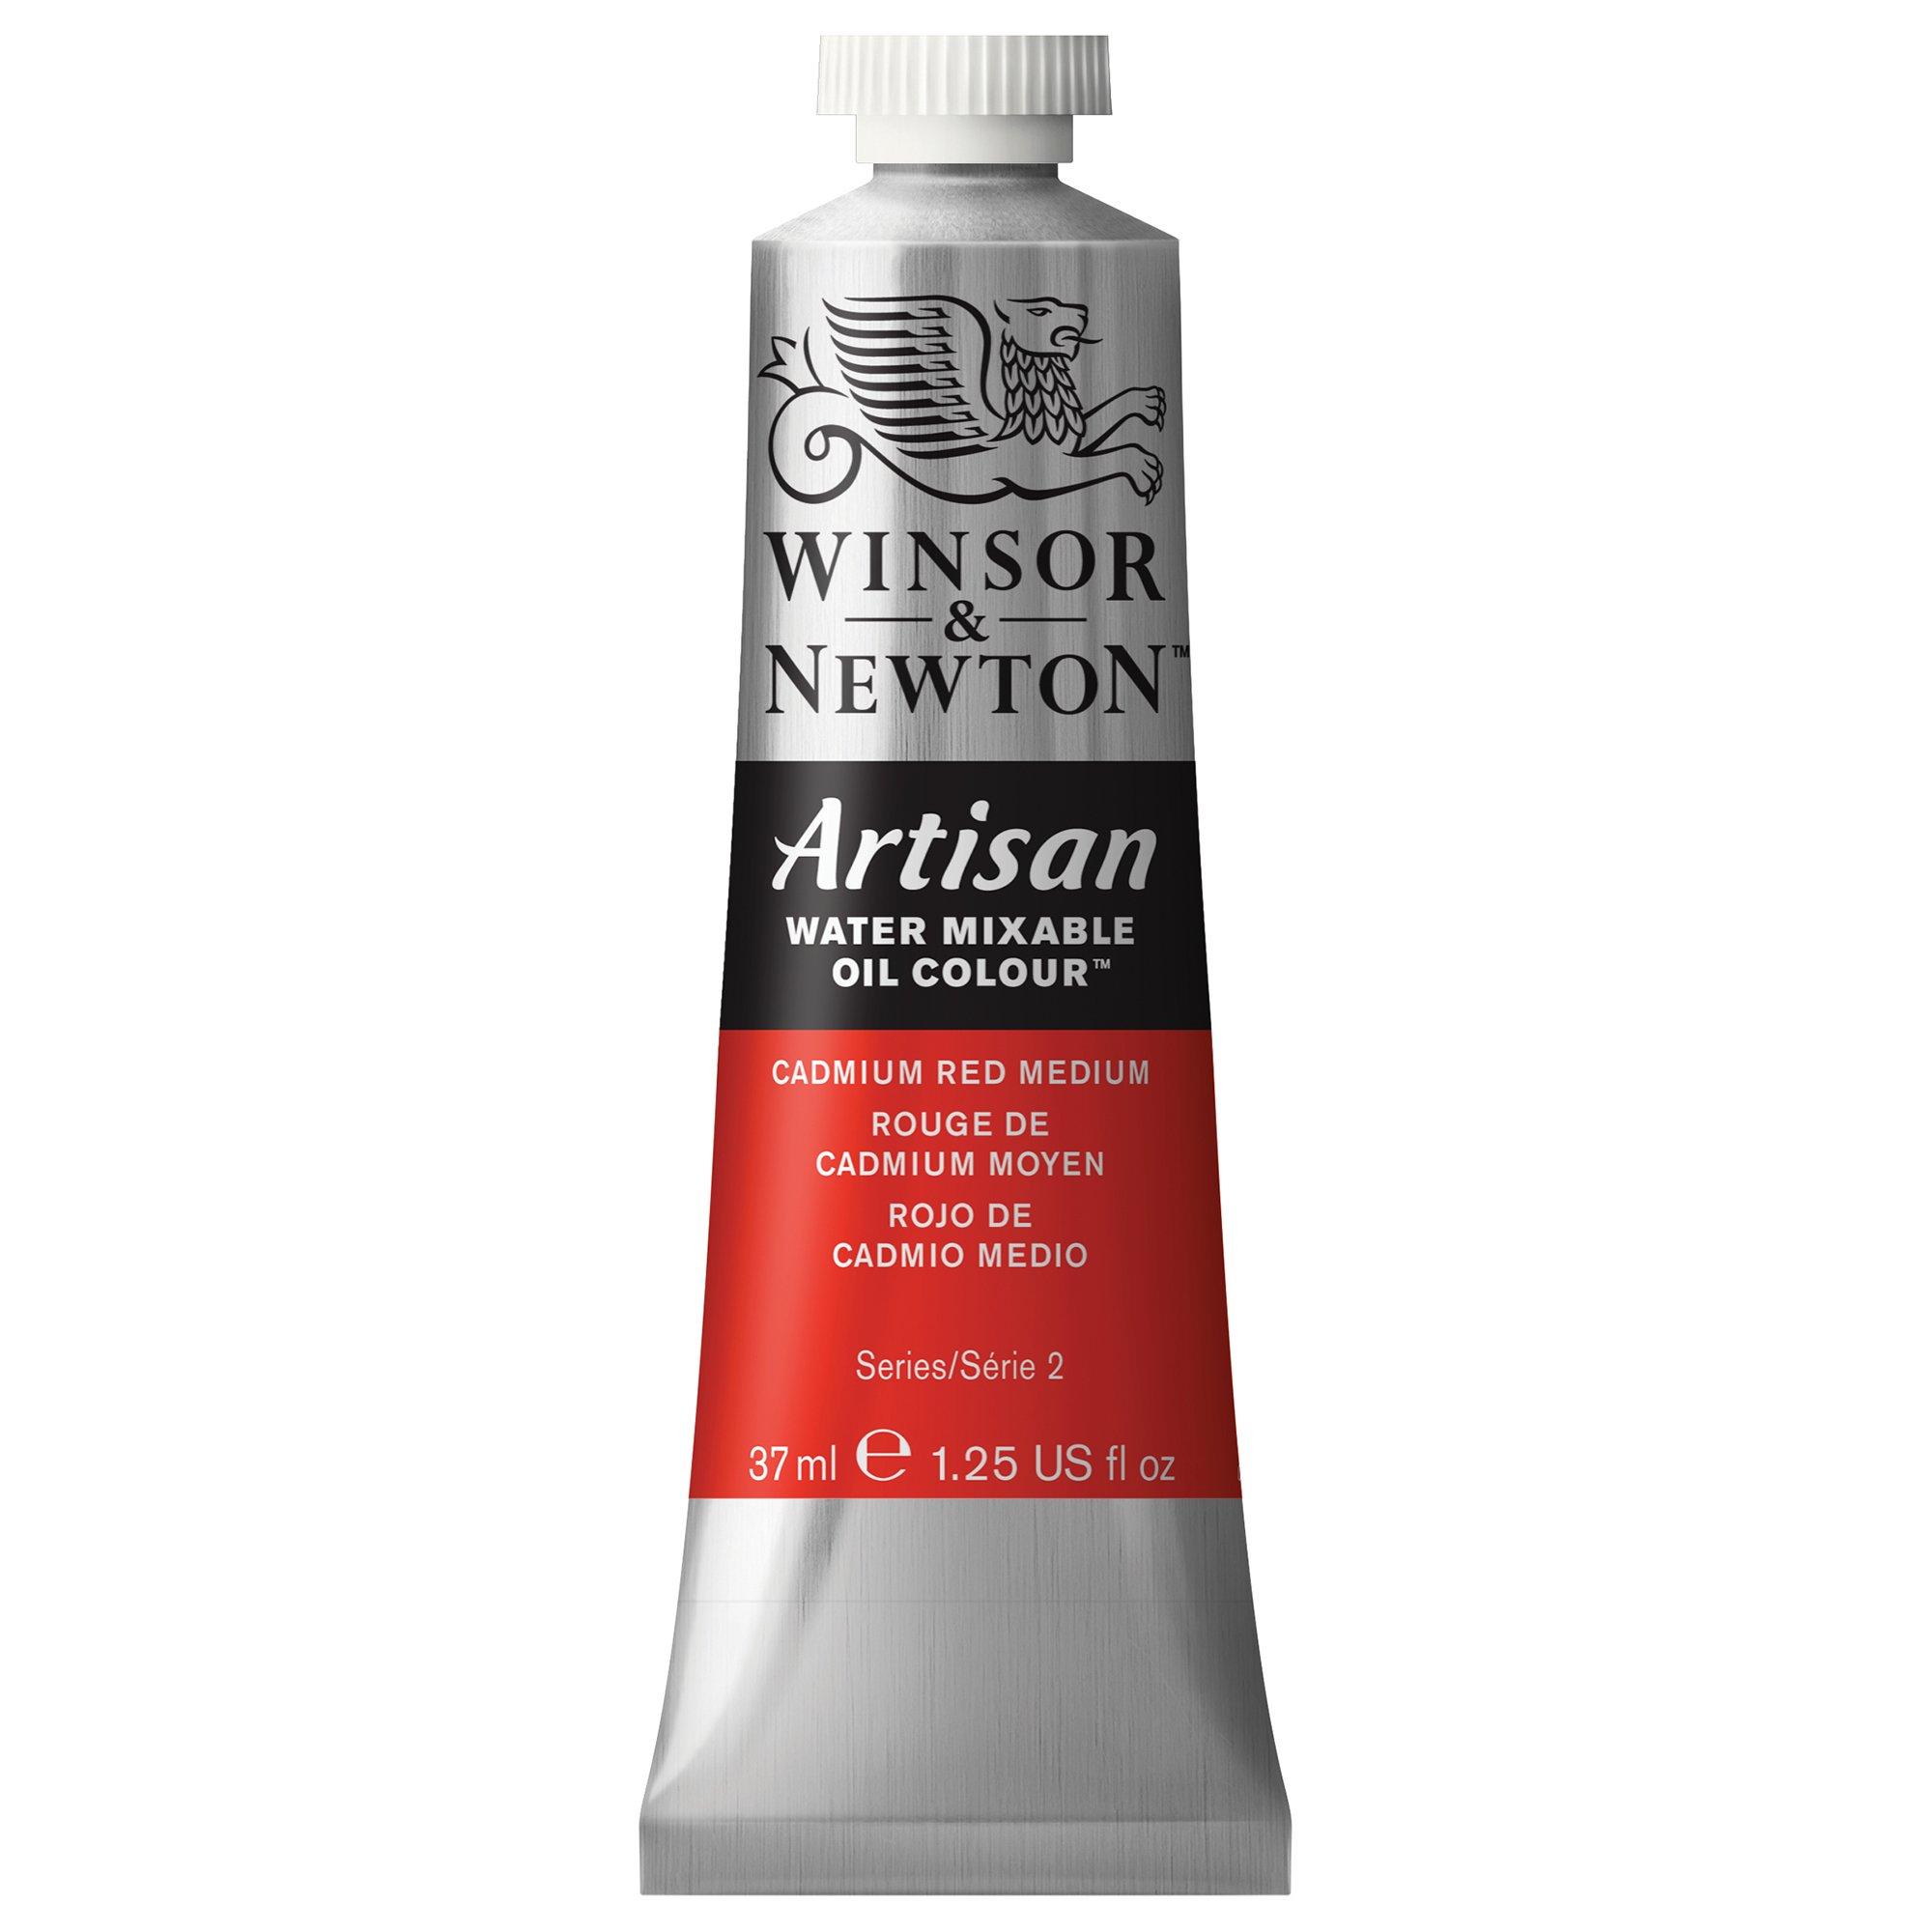 Winsor & Newton 1514099 Artisan Water Mixable Oil Colour 37ml Tube, 37-ml, Cadmium Red Medium